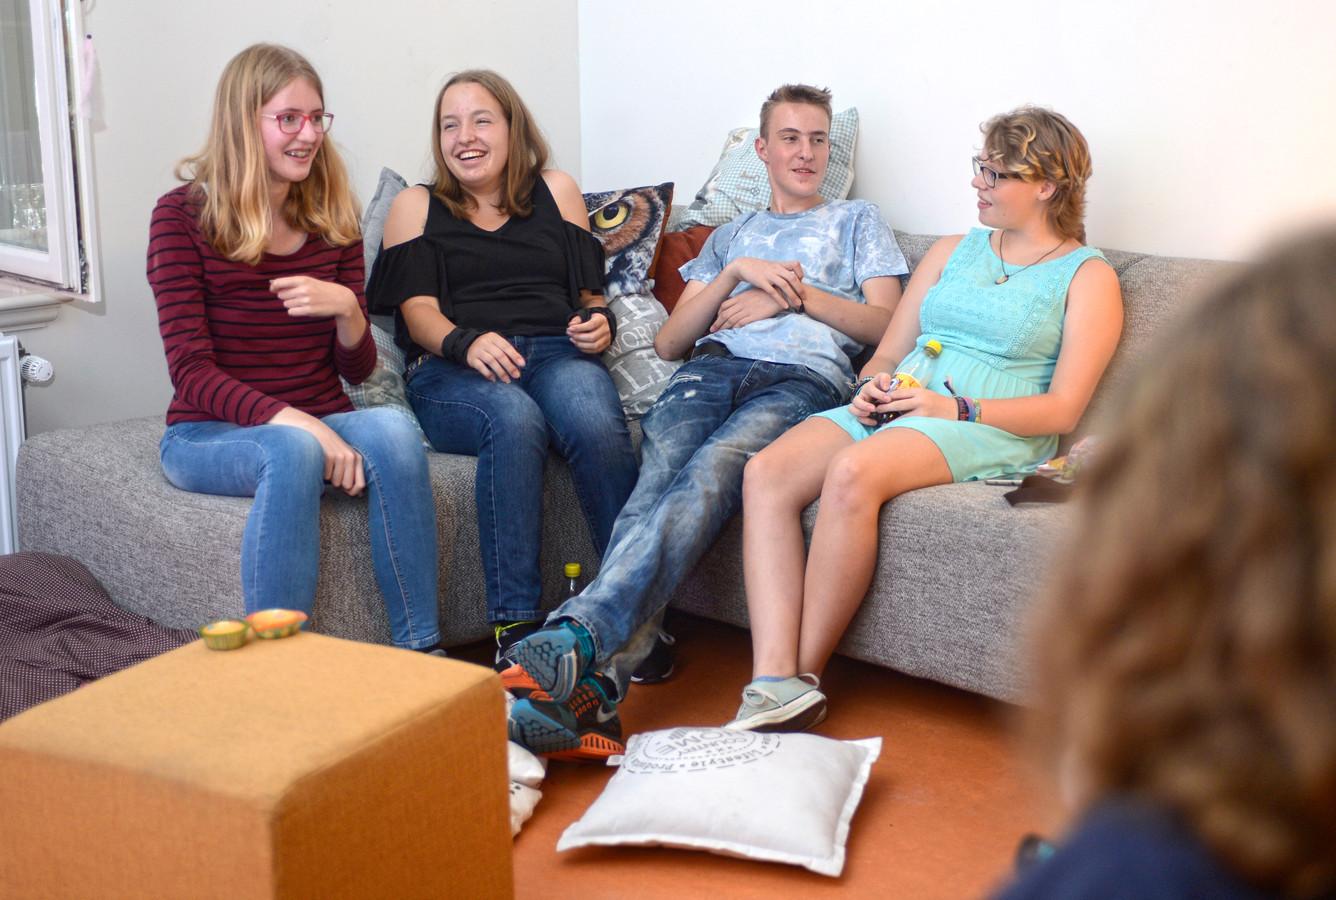 vlnr. Nienke, Janske, Tommy en Frannie, in de Join Us huiskamer boven jongerencentrum de kluis aan de Noordkade te Veghel. Foto uit 2016